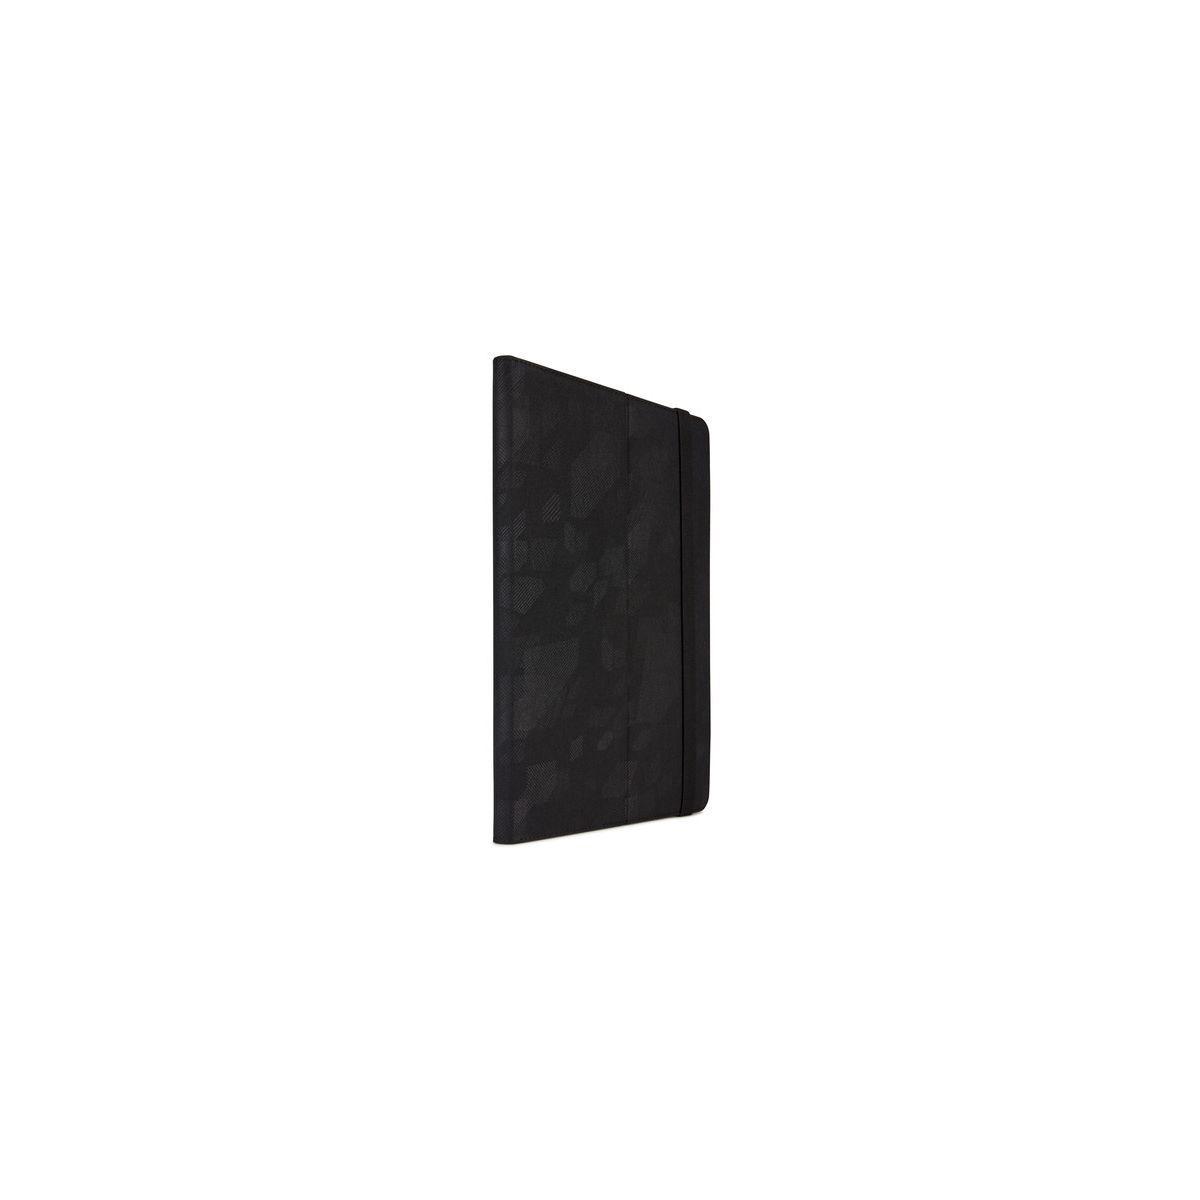 Folio caselogic tablette 9-10'' noir (photo)